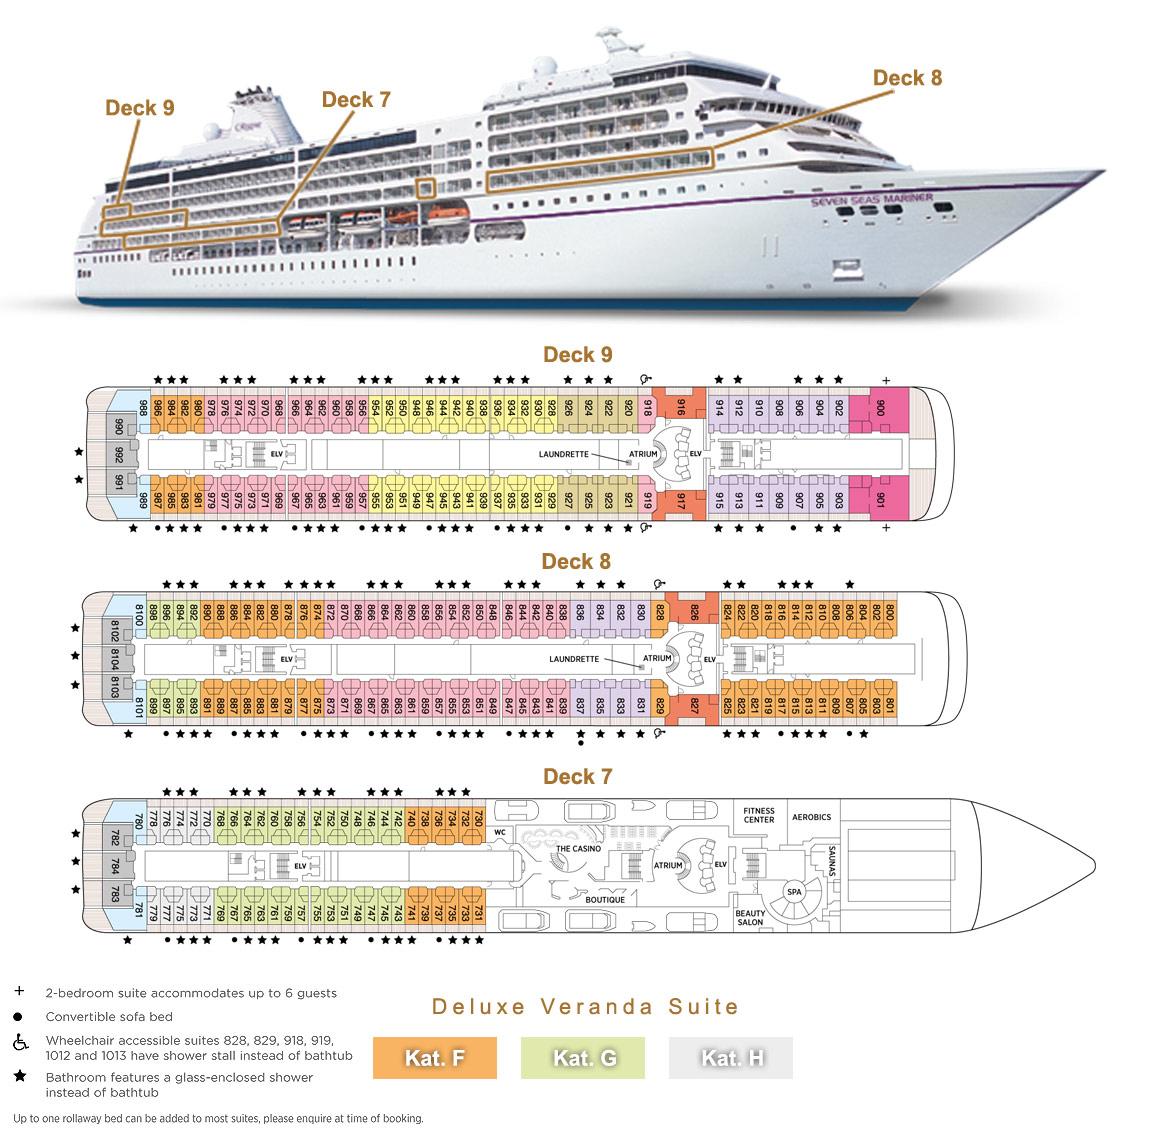 Deluxe Veranda Suite F / G / H - Seven Seas Mariner - Bild 2 - Lage Thumb